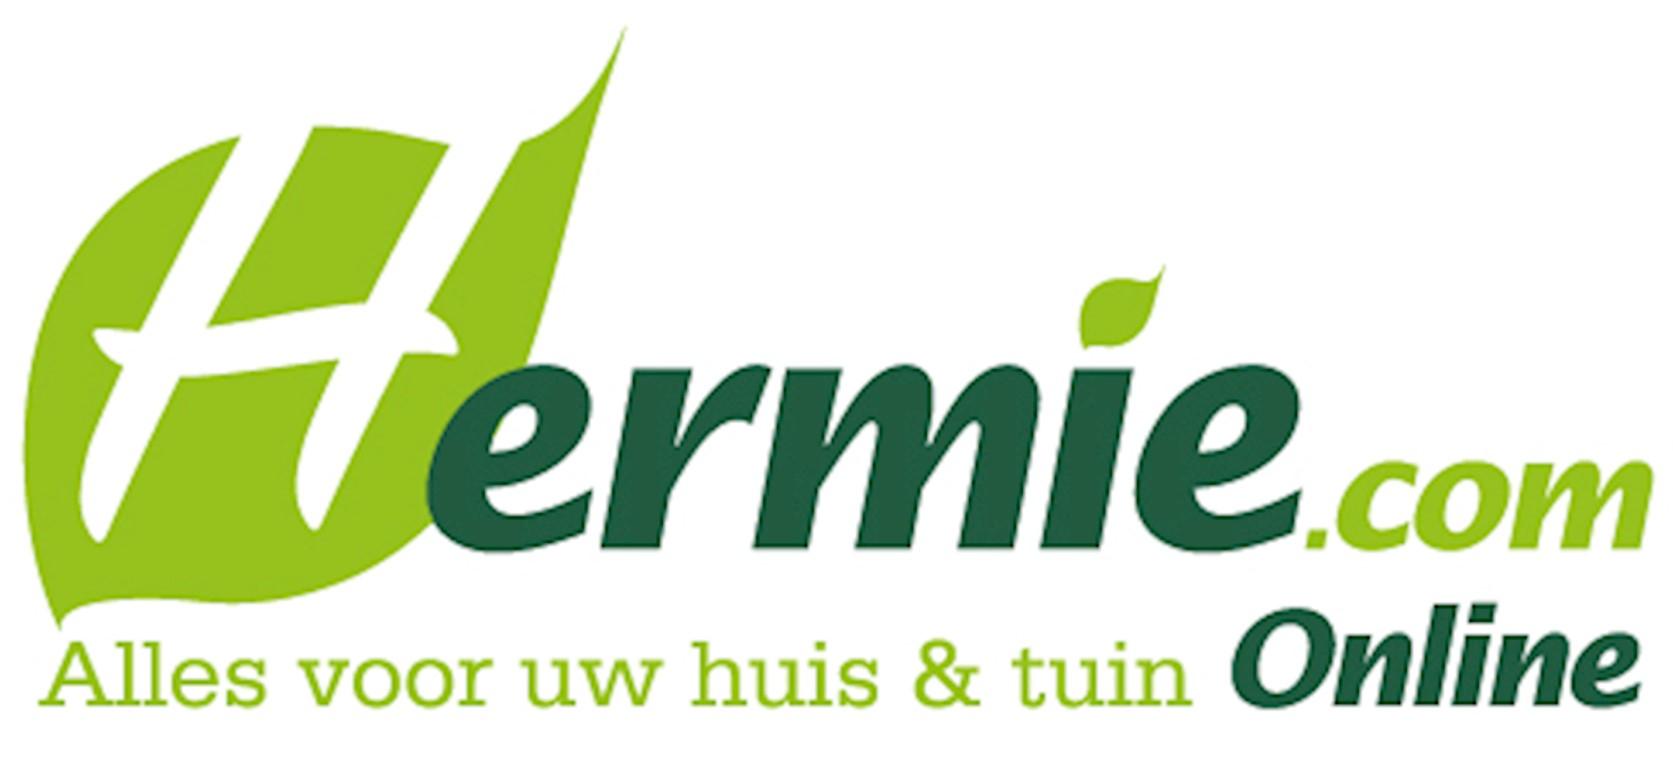 10 euro korting bij Hermie.com